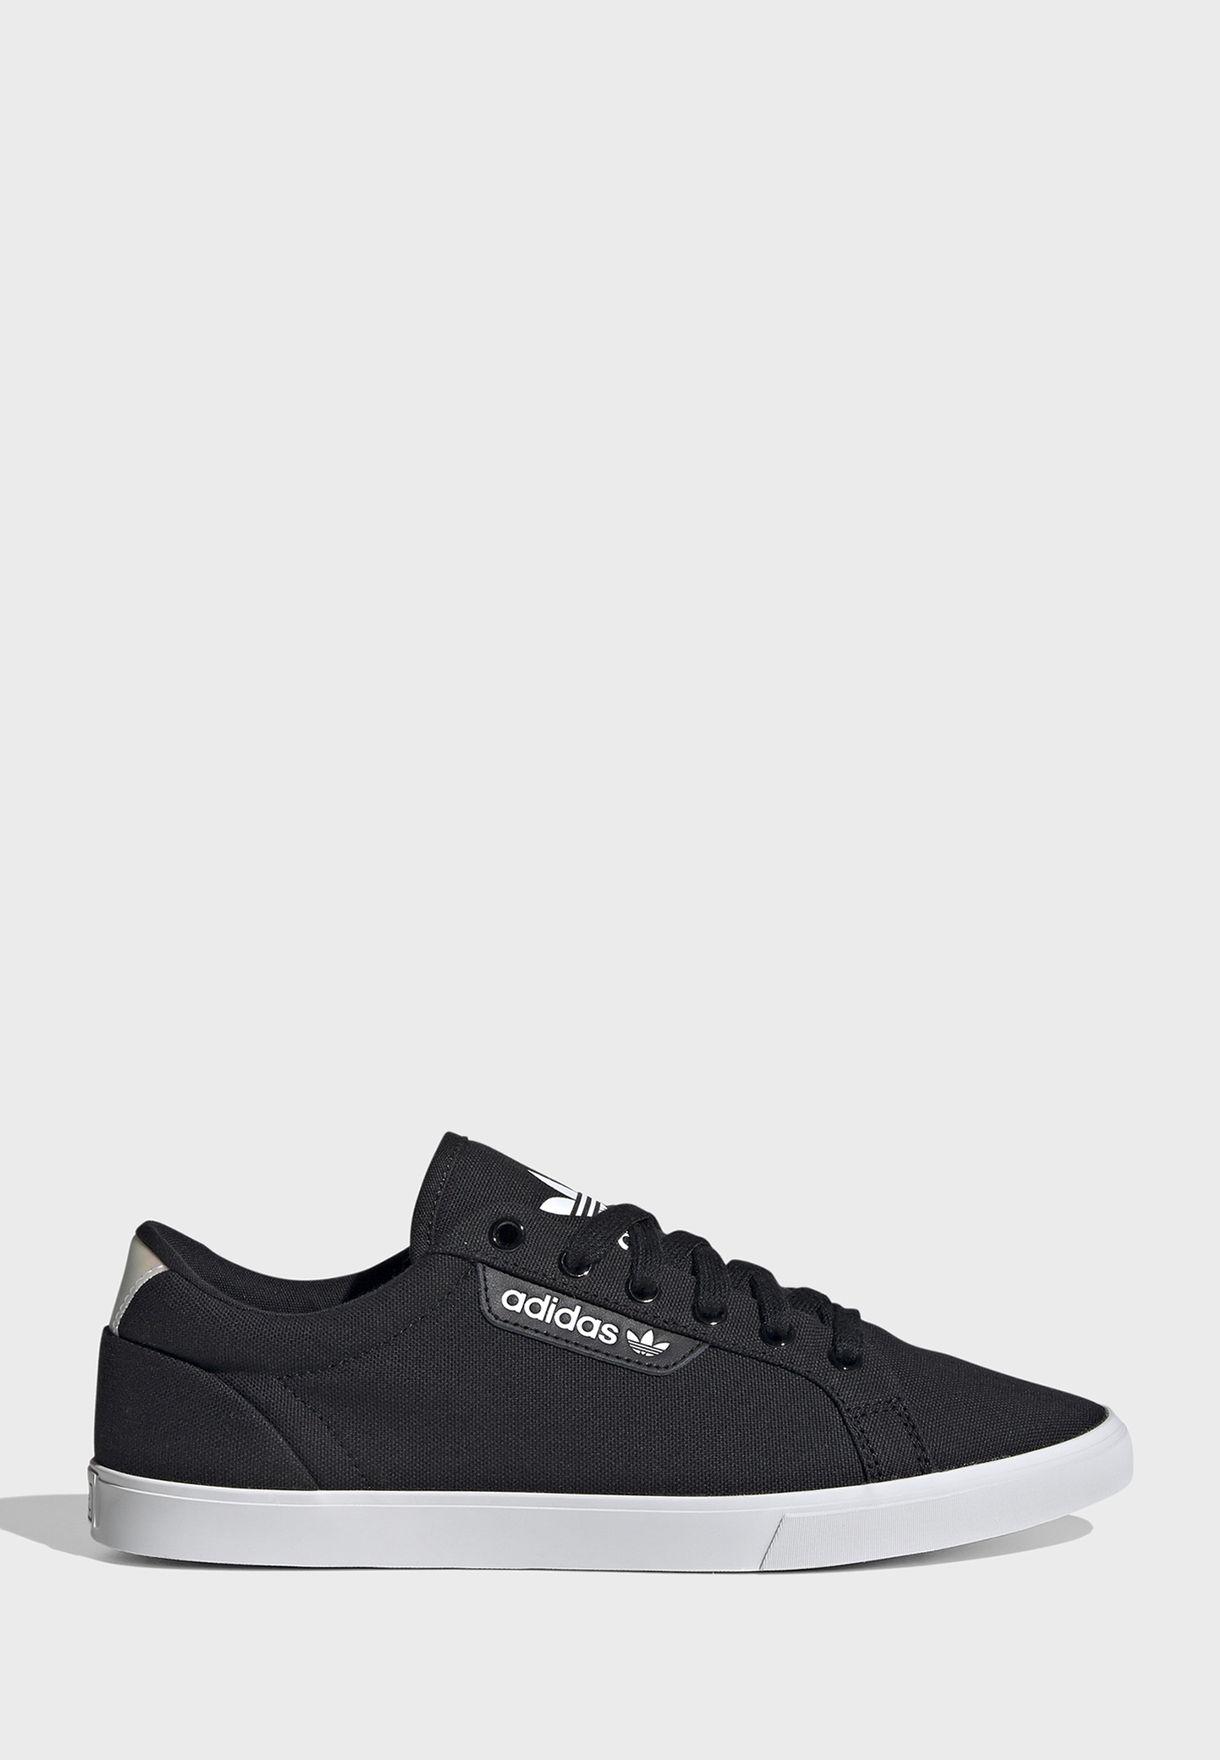 Adidas Sleek Classic Casual Women's Sneakers Shoes